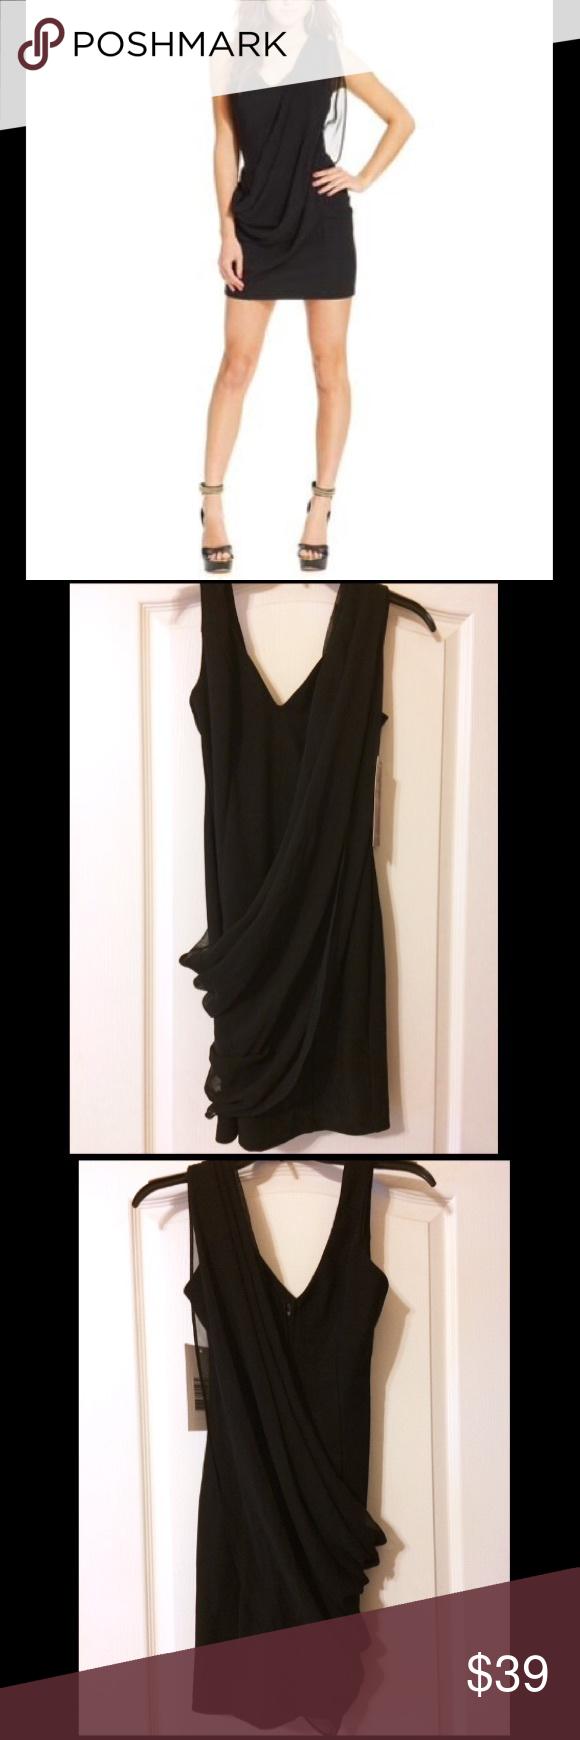 Emerald sundae black draped chiffon bodycon dress nwt pinterest